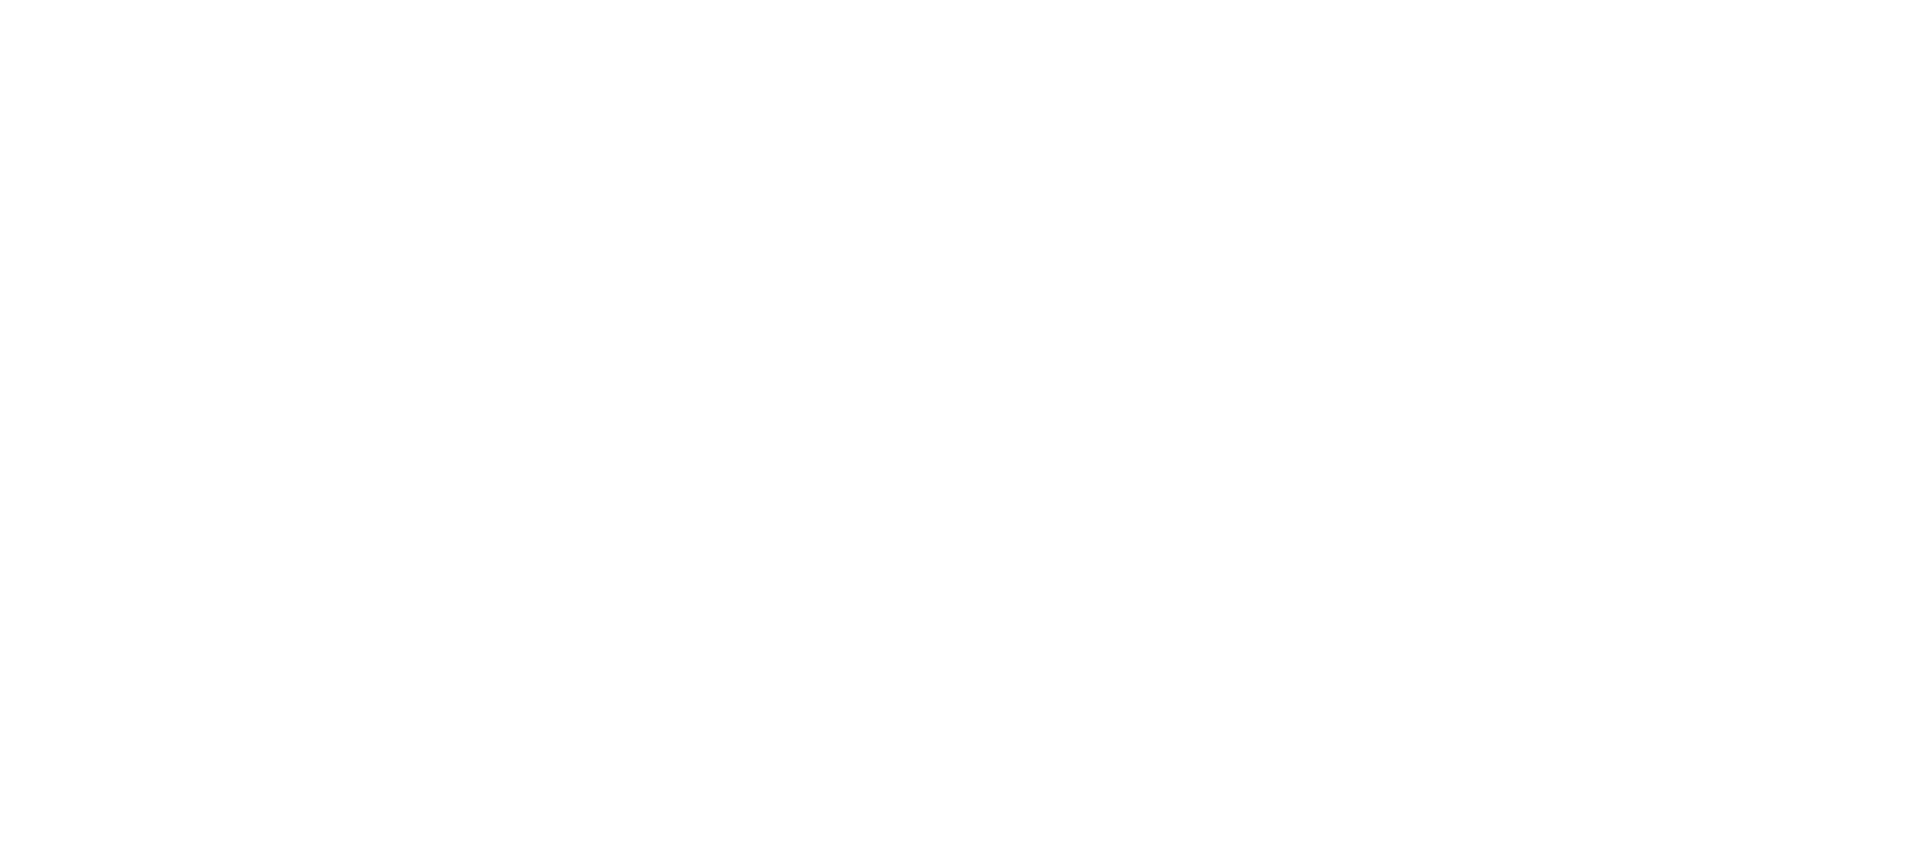 Standard Solar sign